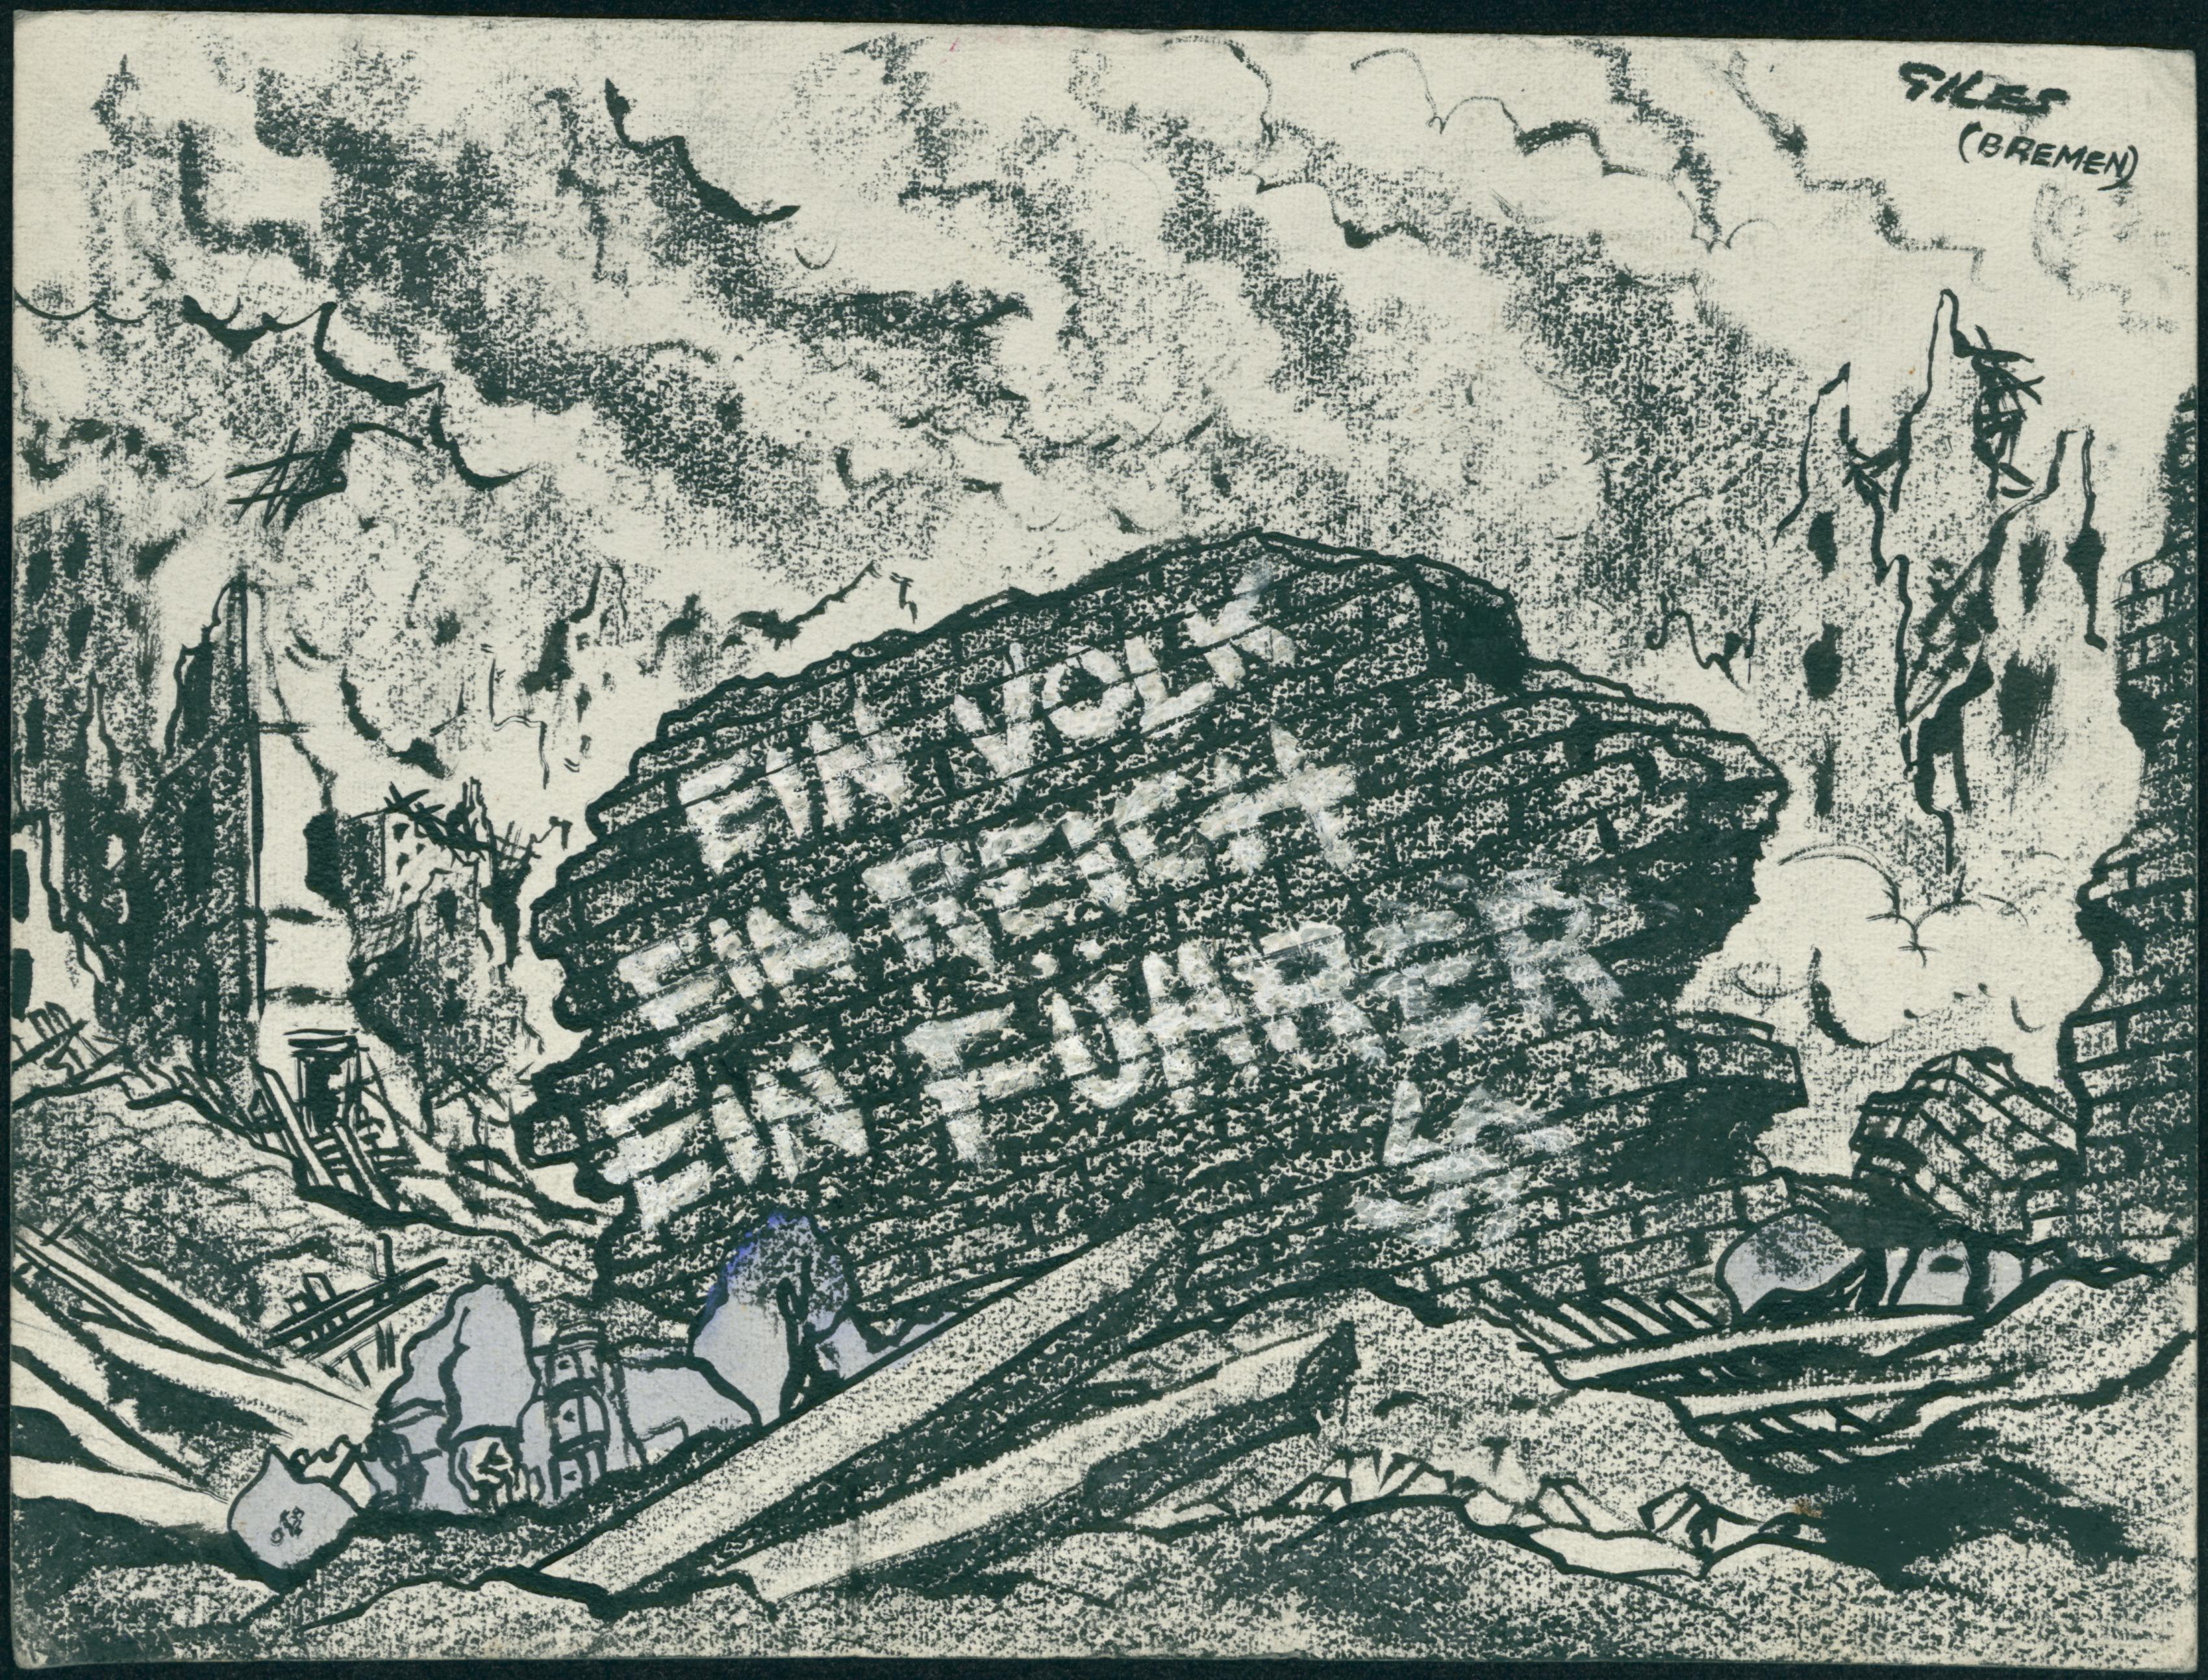 Carl Giles, 'German Landscape', Daily Express, 29th April 1945 (GA5440)